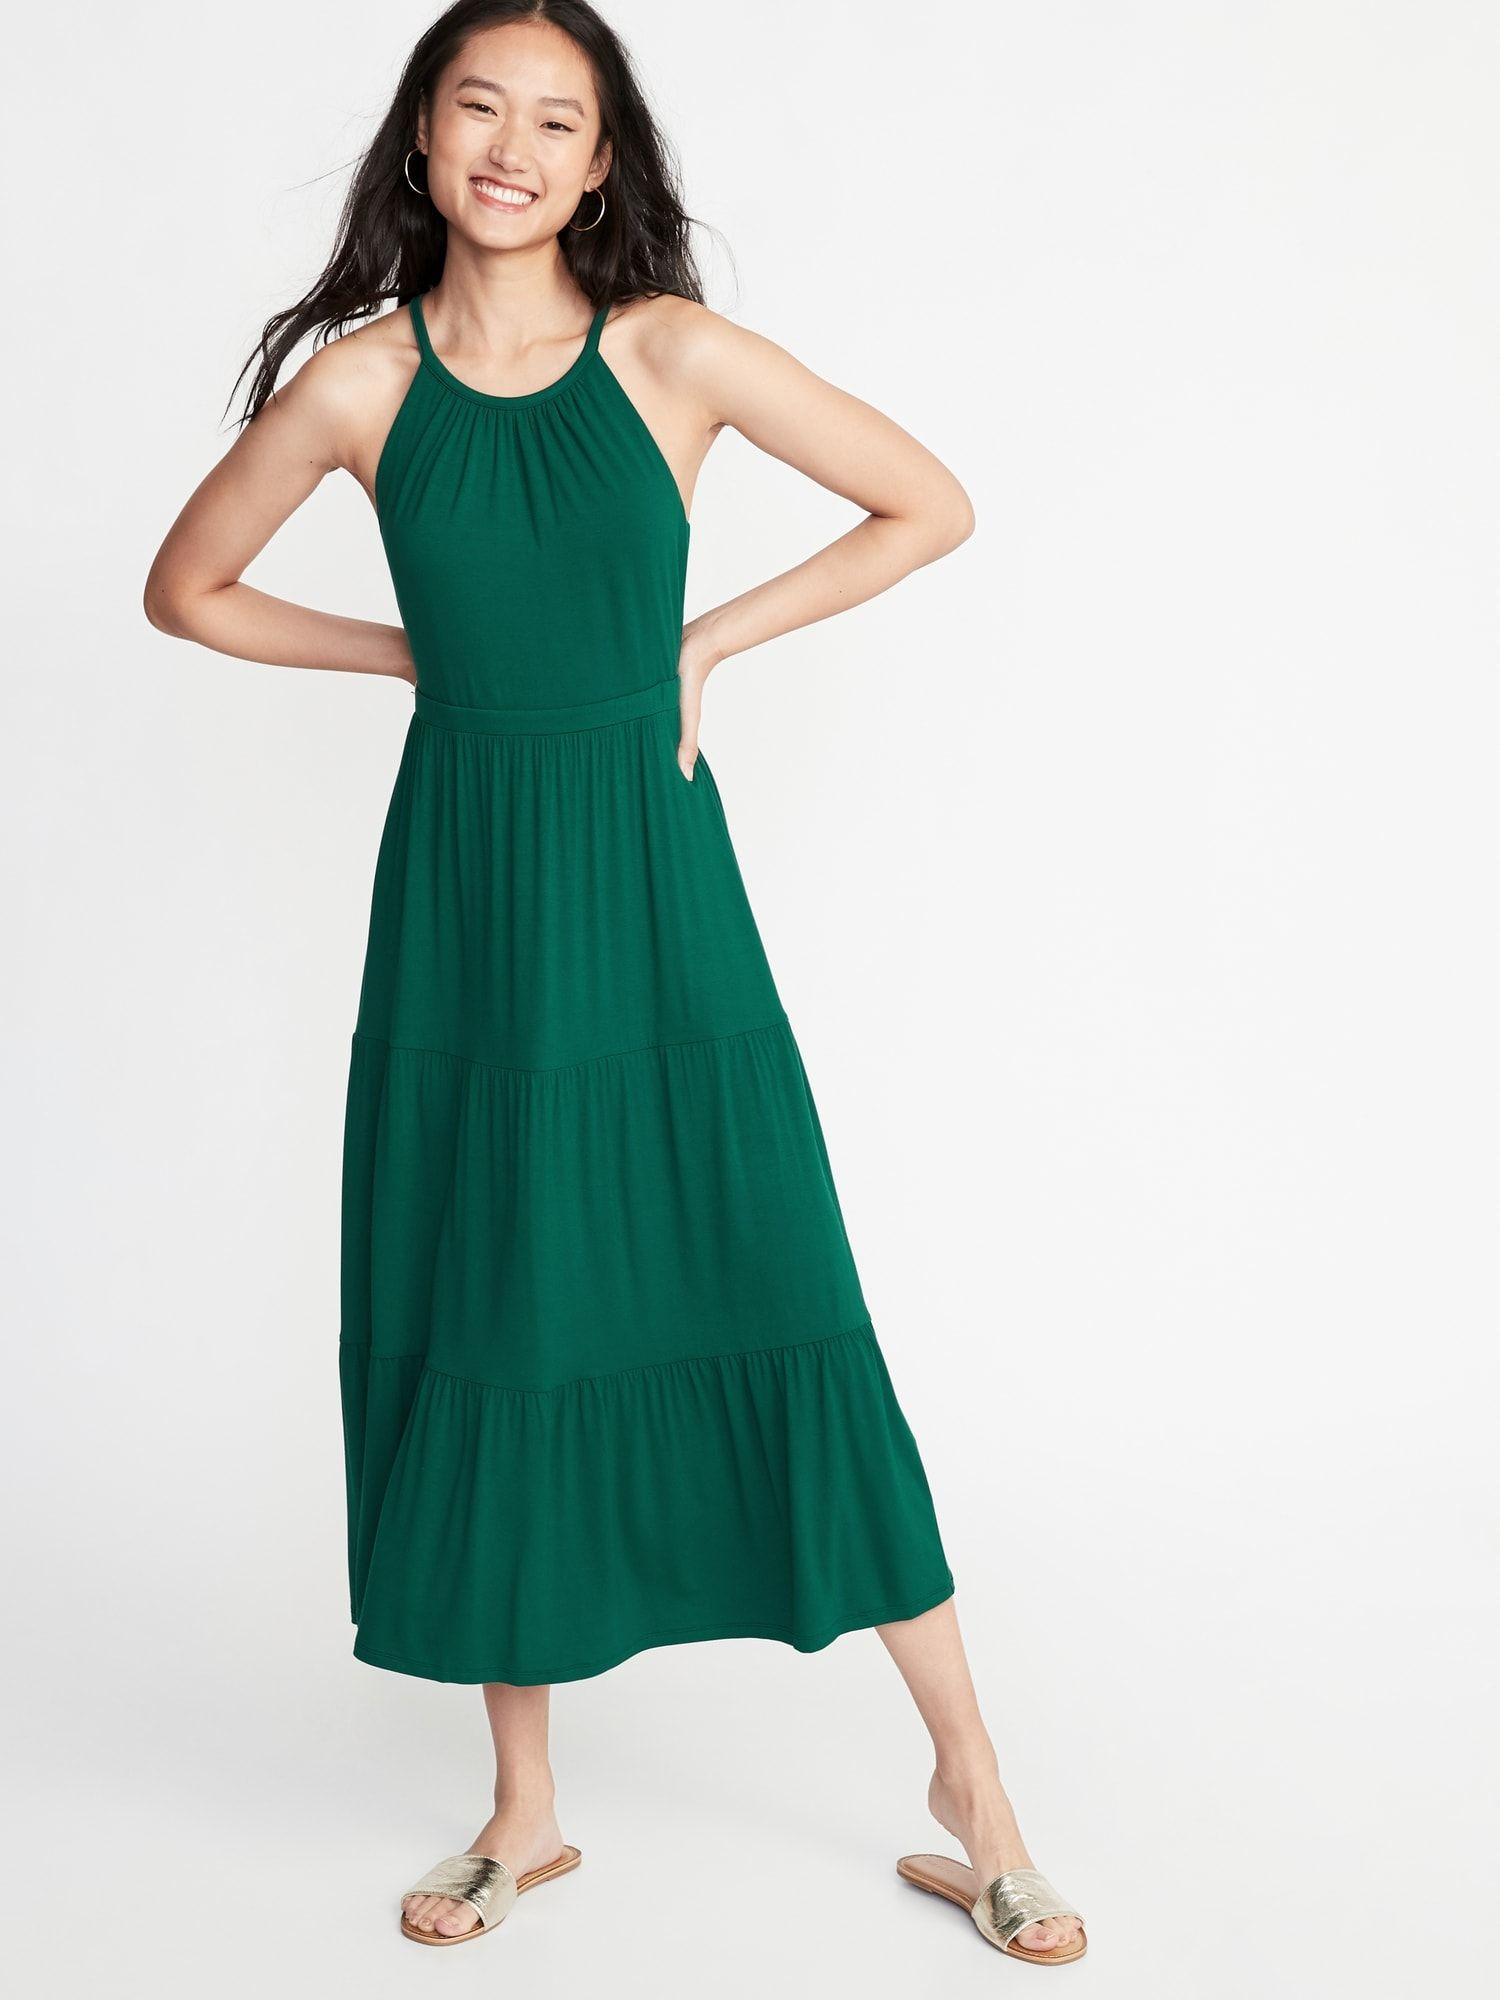 cfbb497a3c4 High-Neck Waist-Defined Maxi Dress for Women in 2019